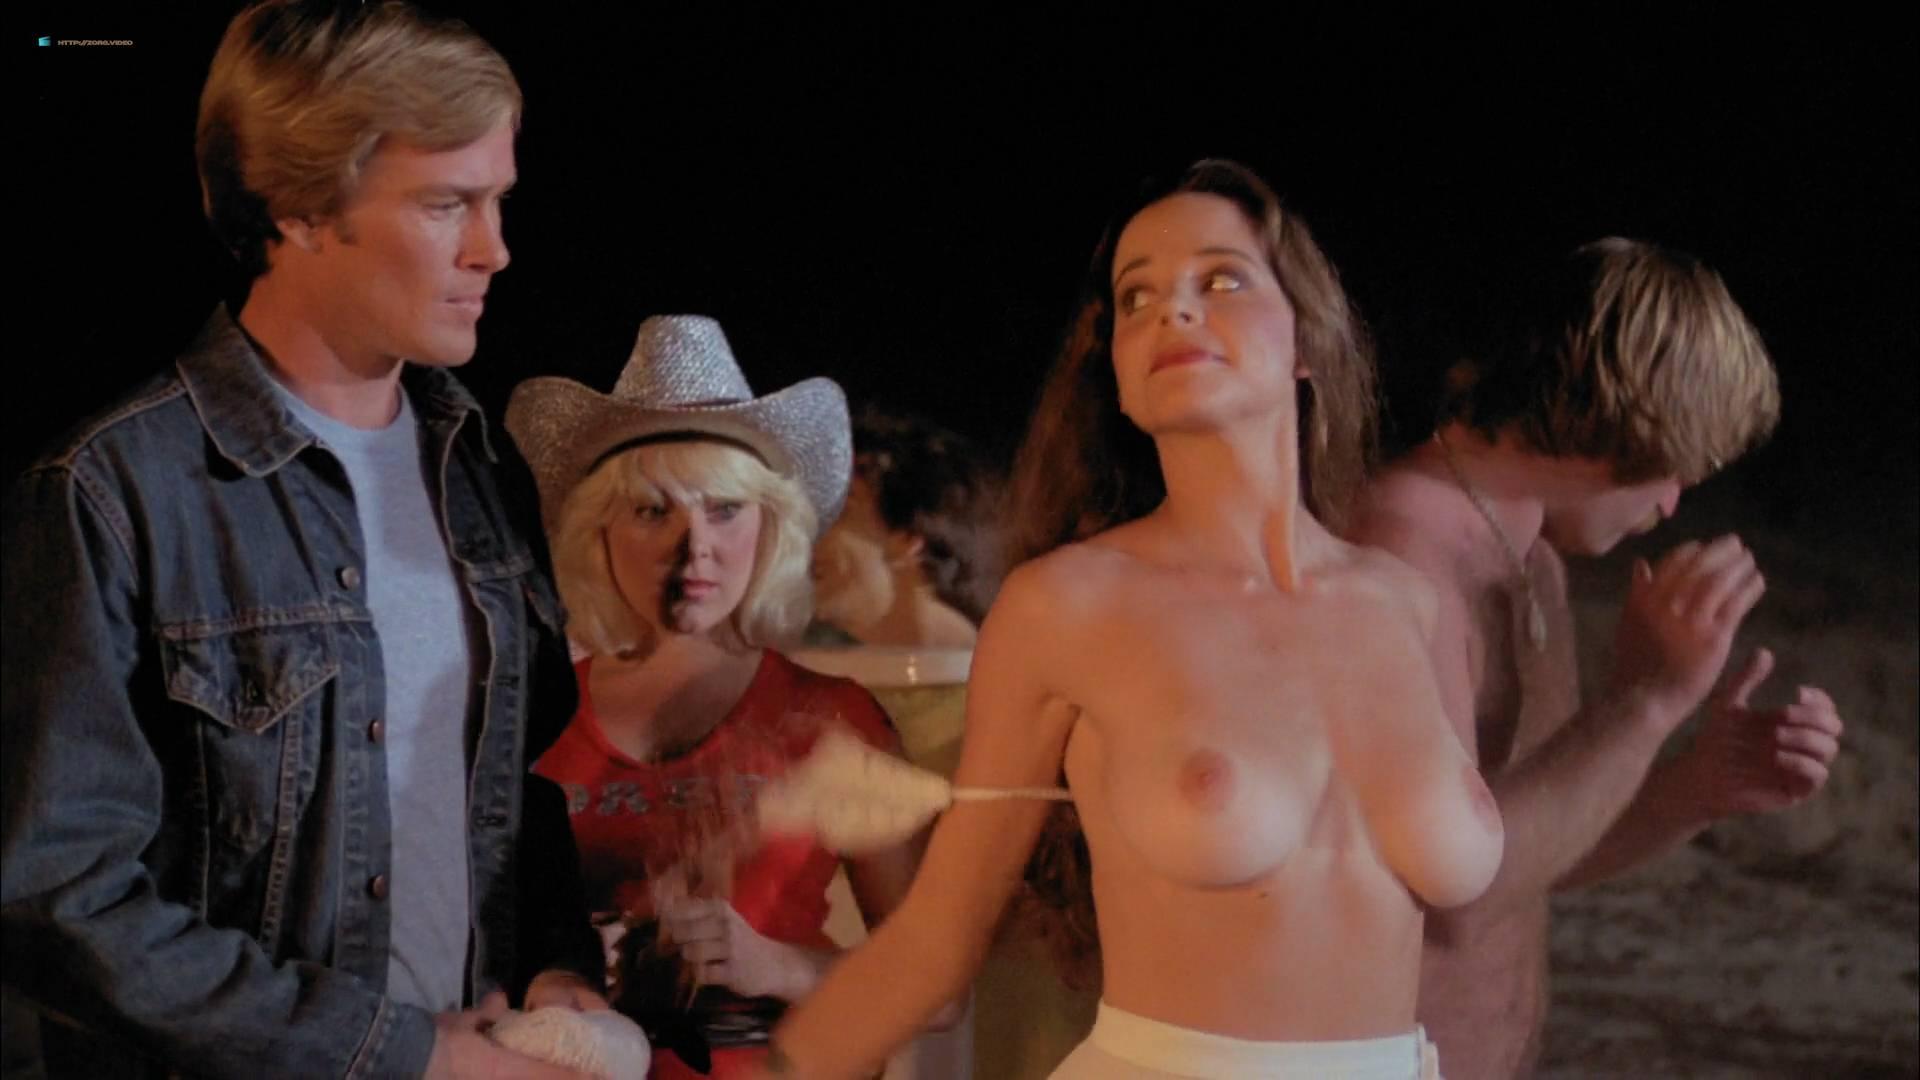 Hot female celebrities naked